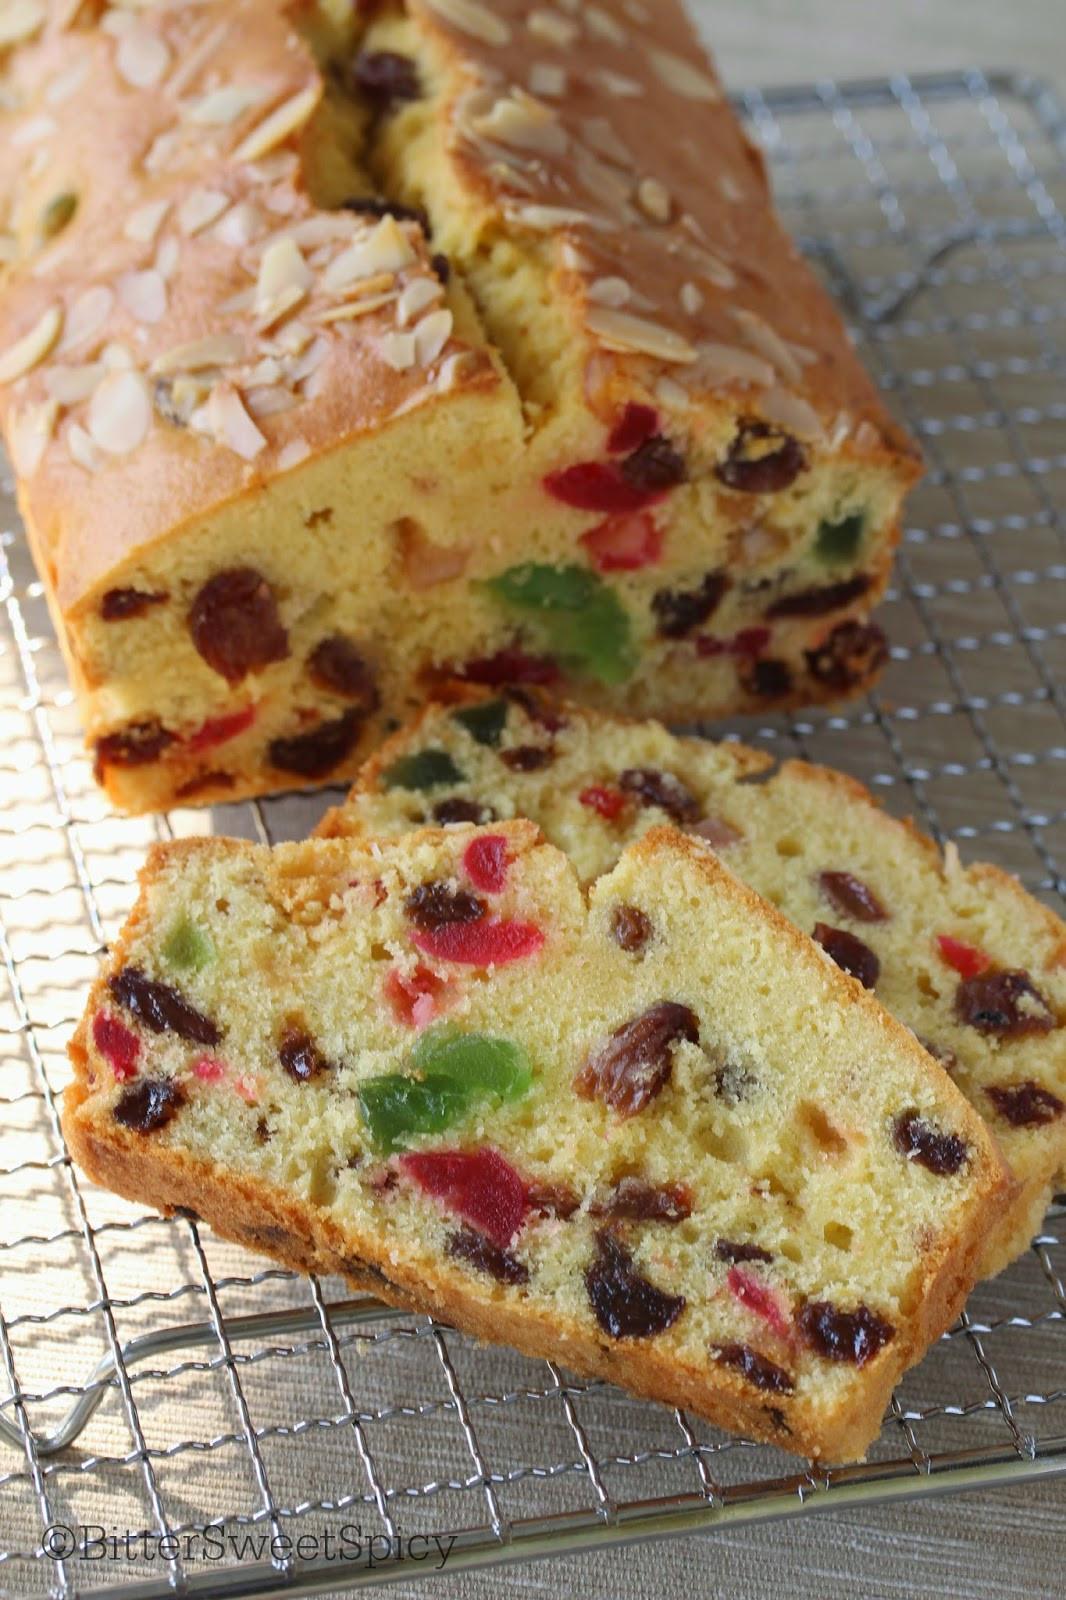 Fruit Cake Recipe  BitterSweetSpicy Light Fruit Cake